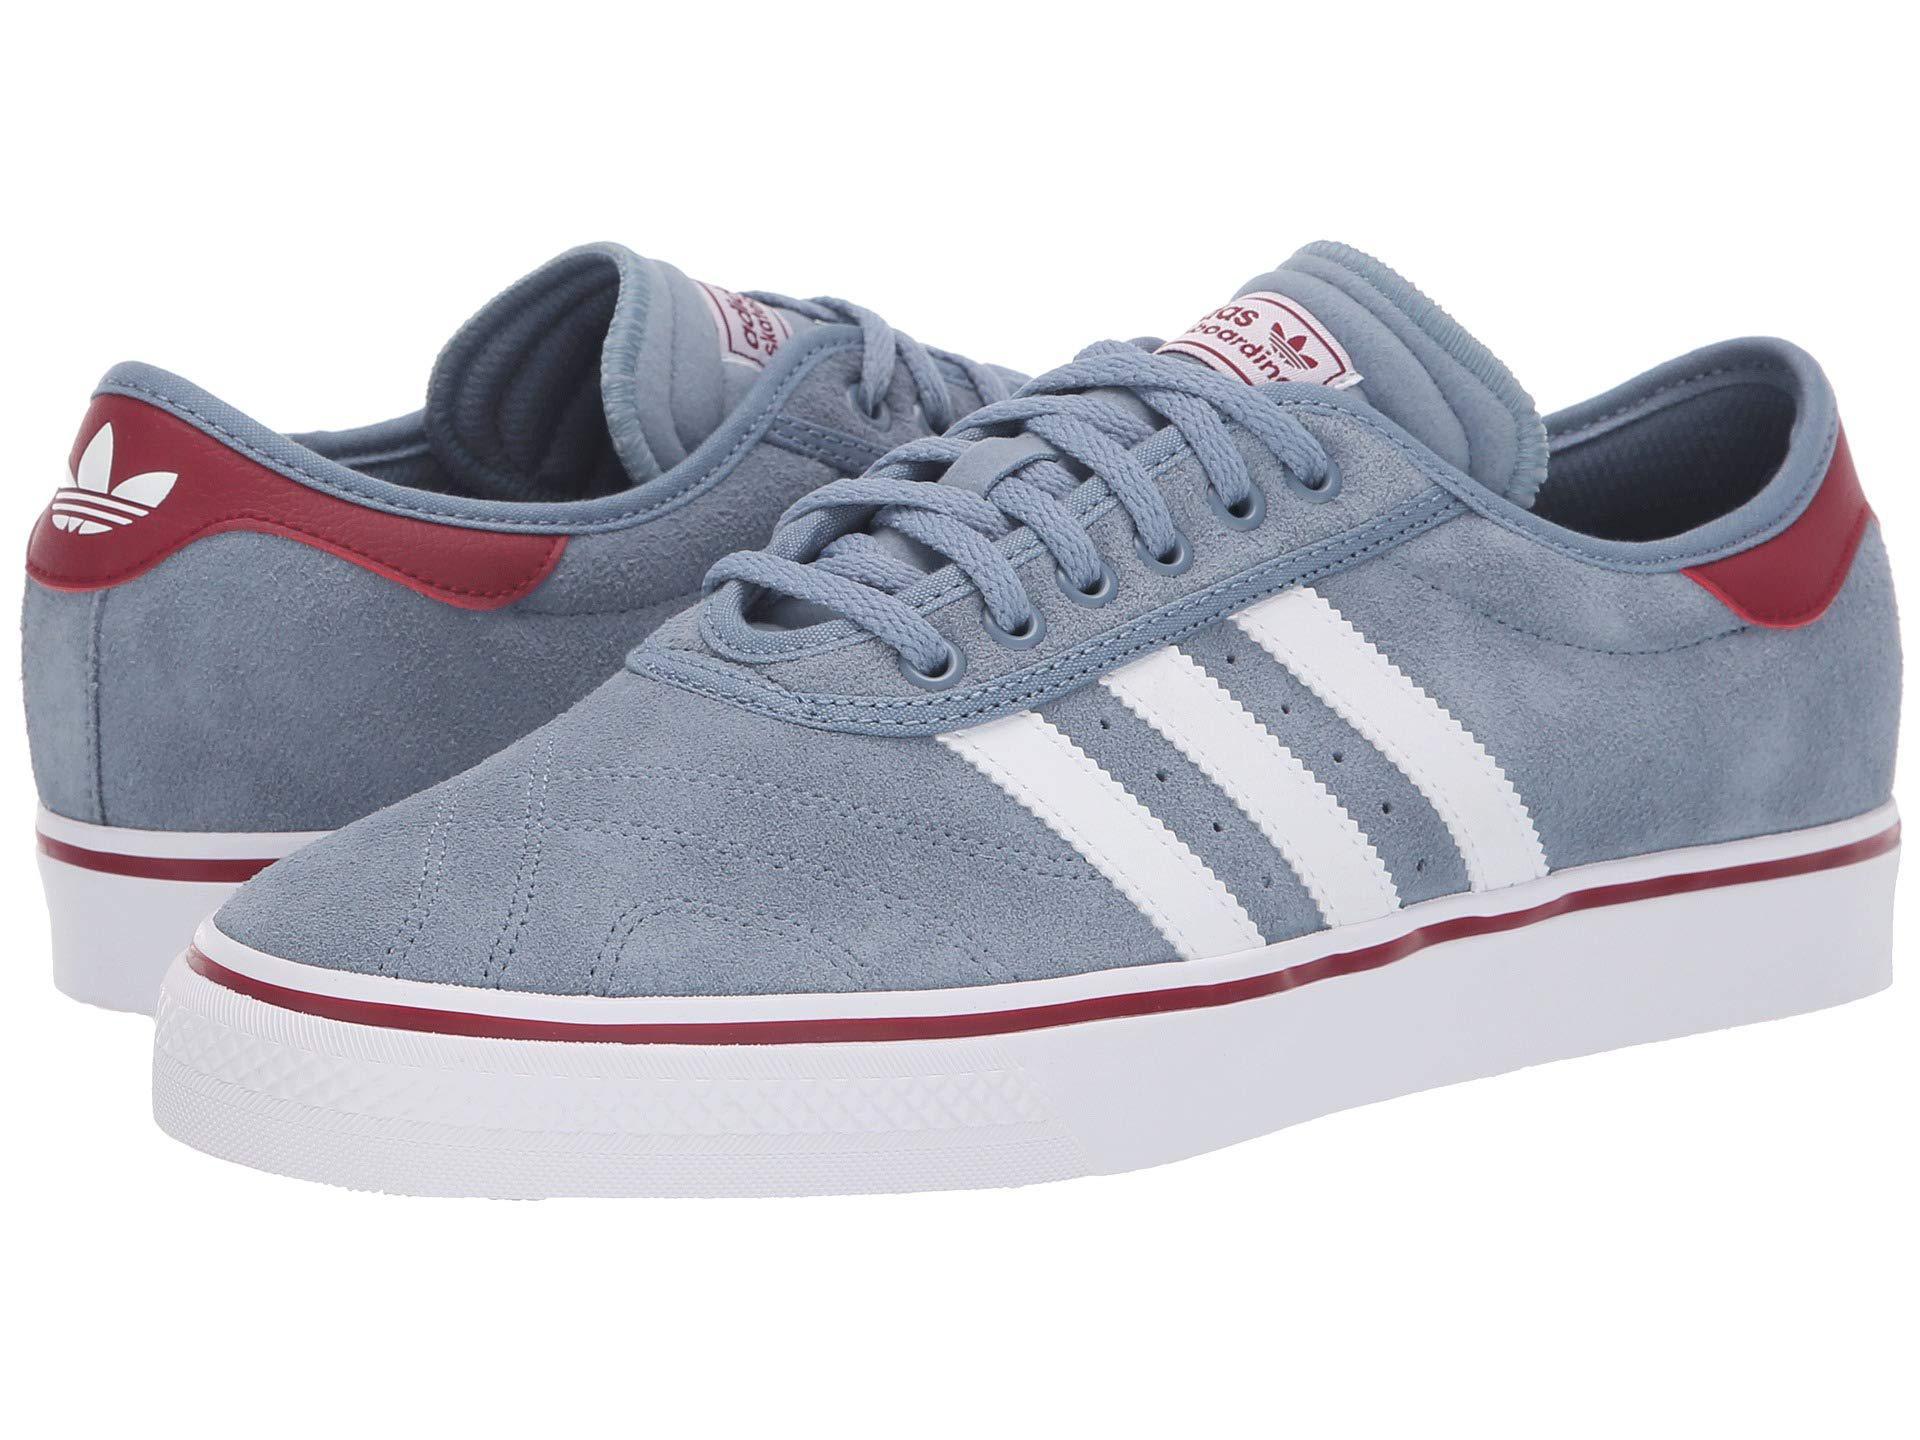 c804cb3524e3 adidas Originals. Gray Adi-ease Premiere (raw Steel white collegiate  Burgundy) Men s Skate Shoes